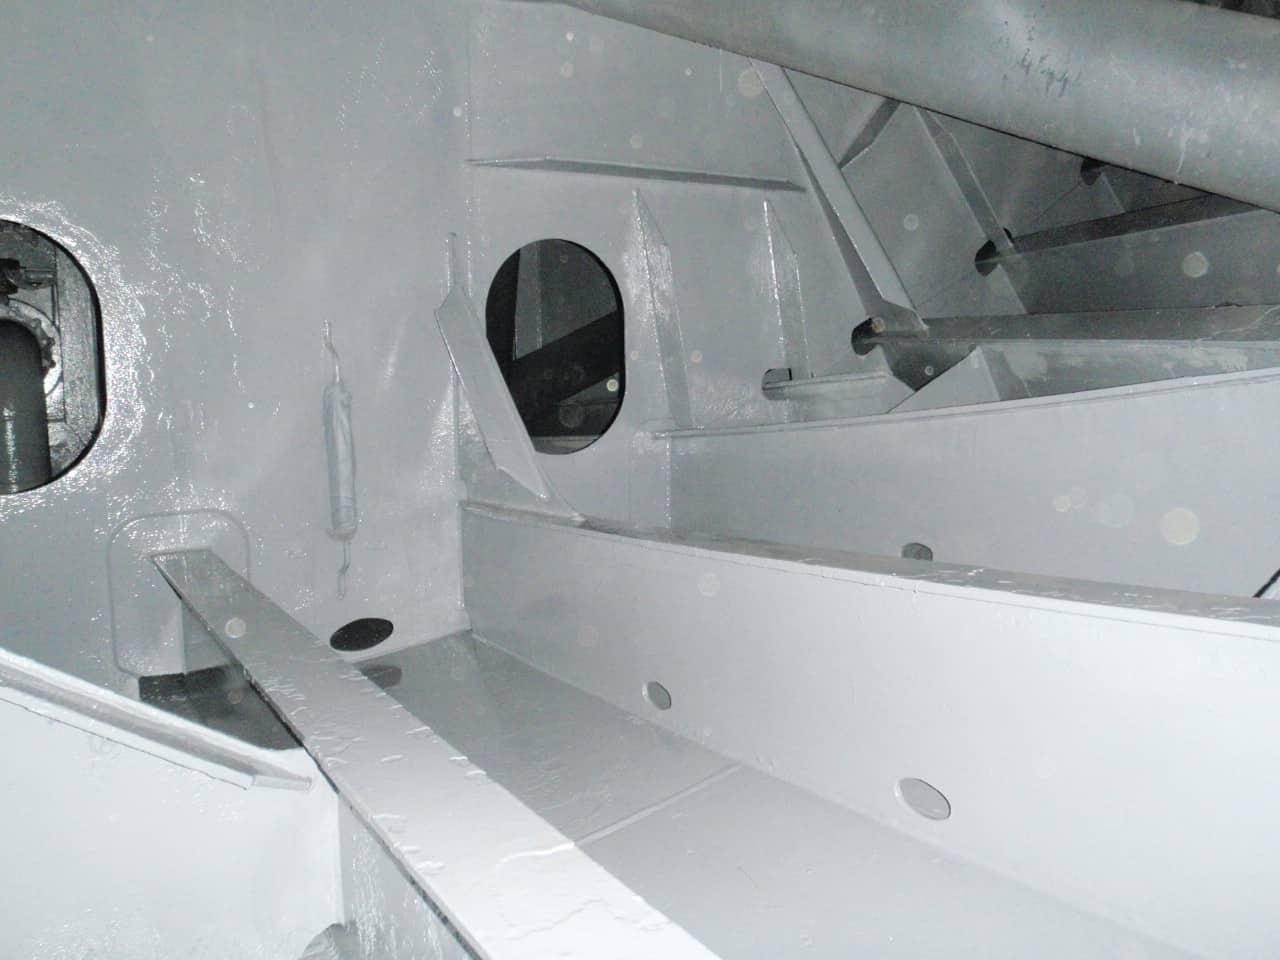 freshly painted grey ballast tank internals